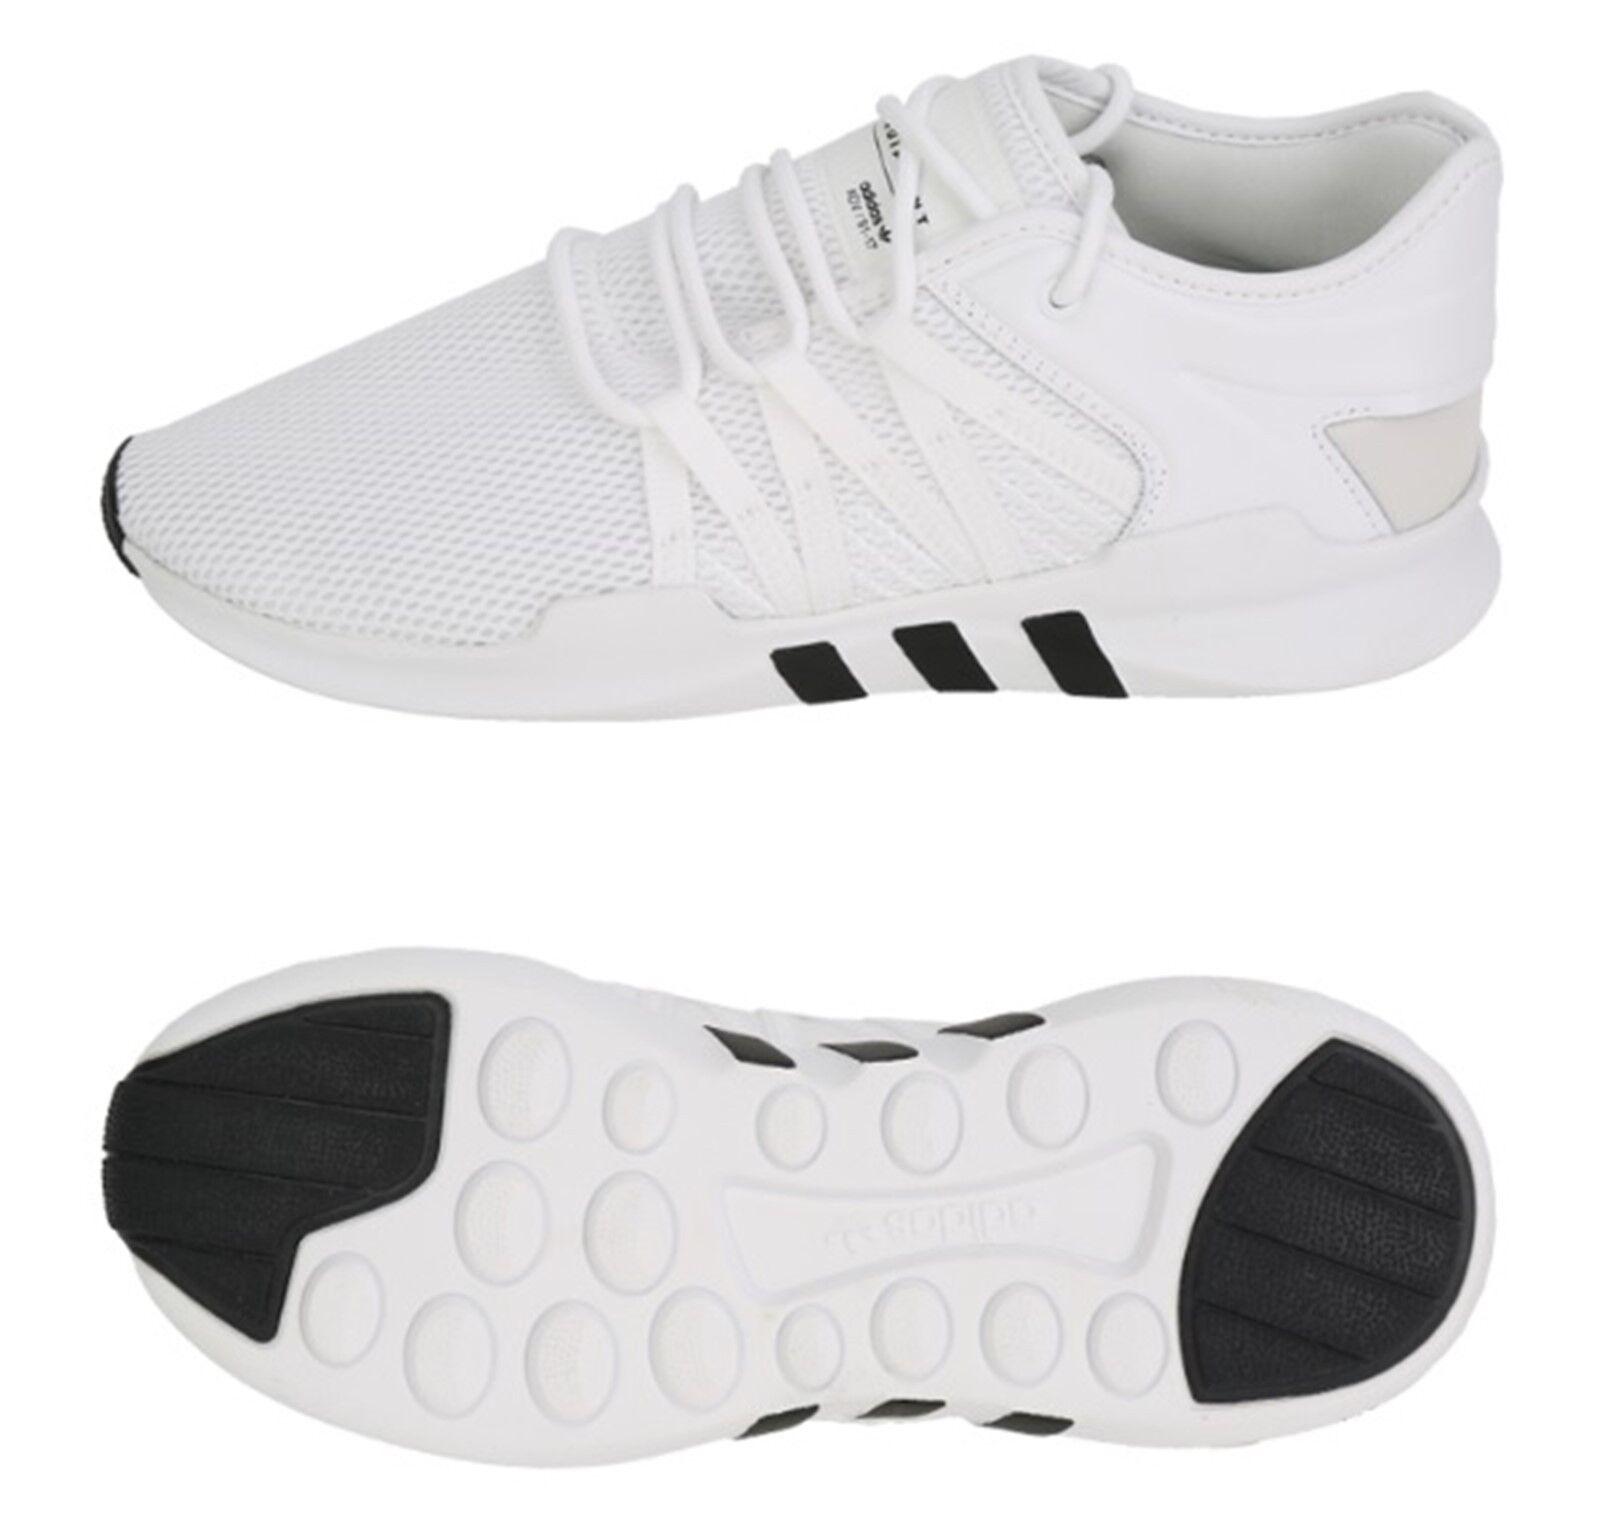 Adidas Women Originals EQT Racing shoes Running White Casual Sneakers CQ2160